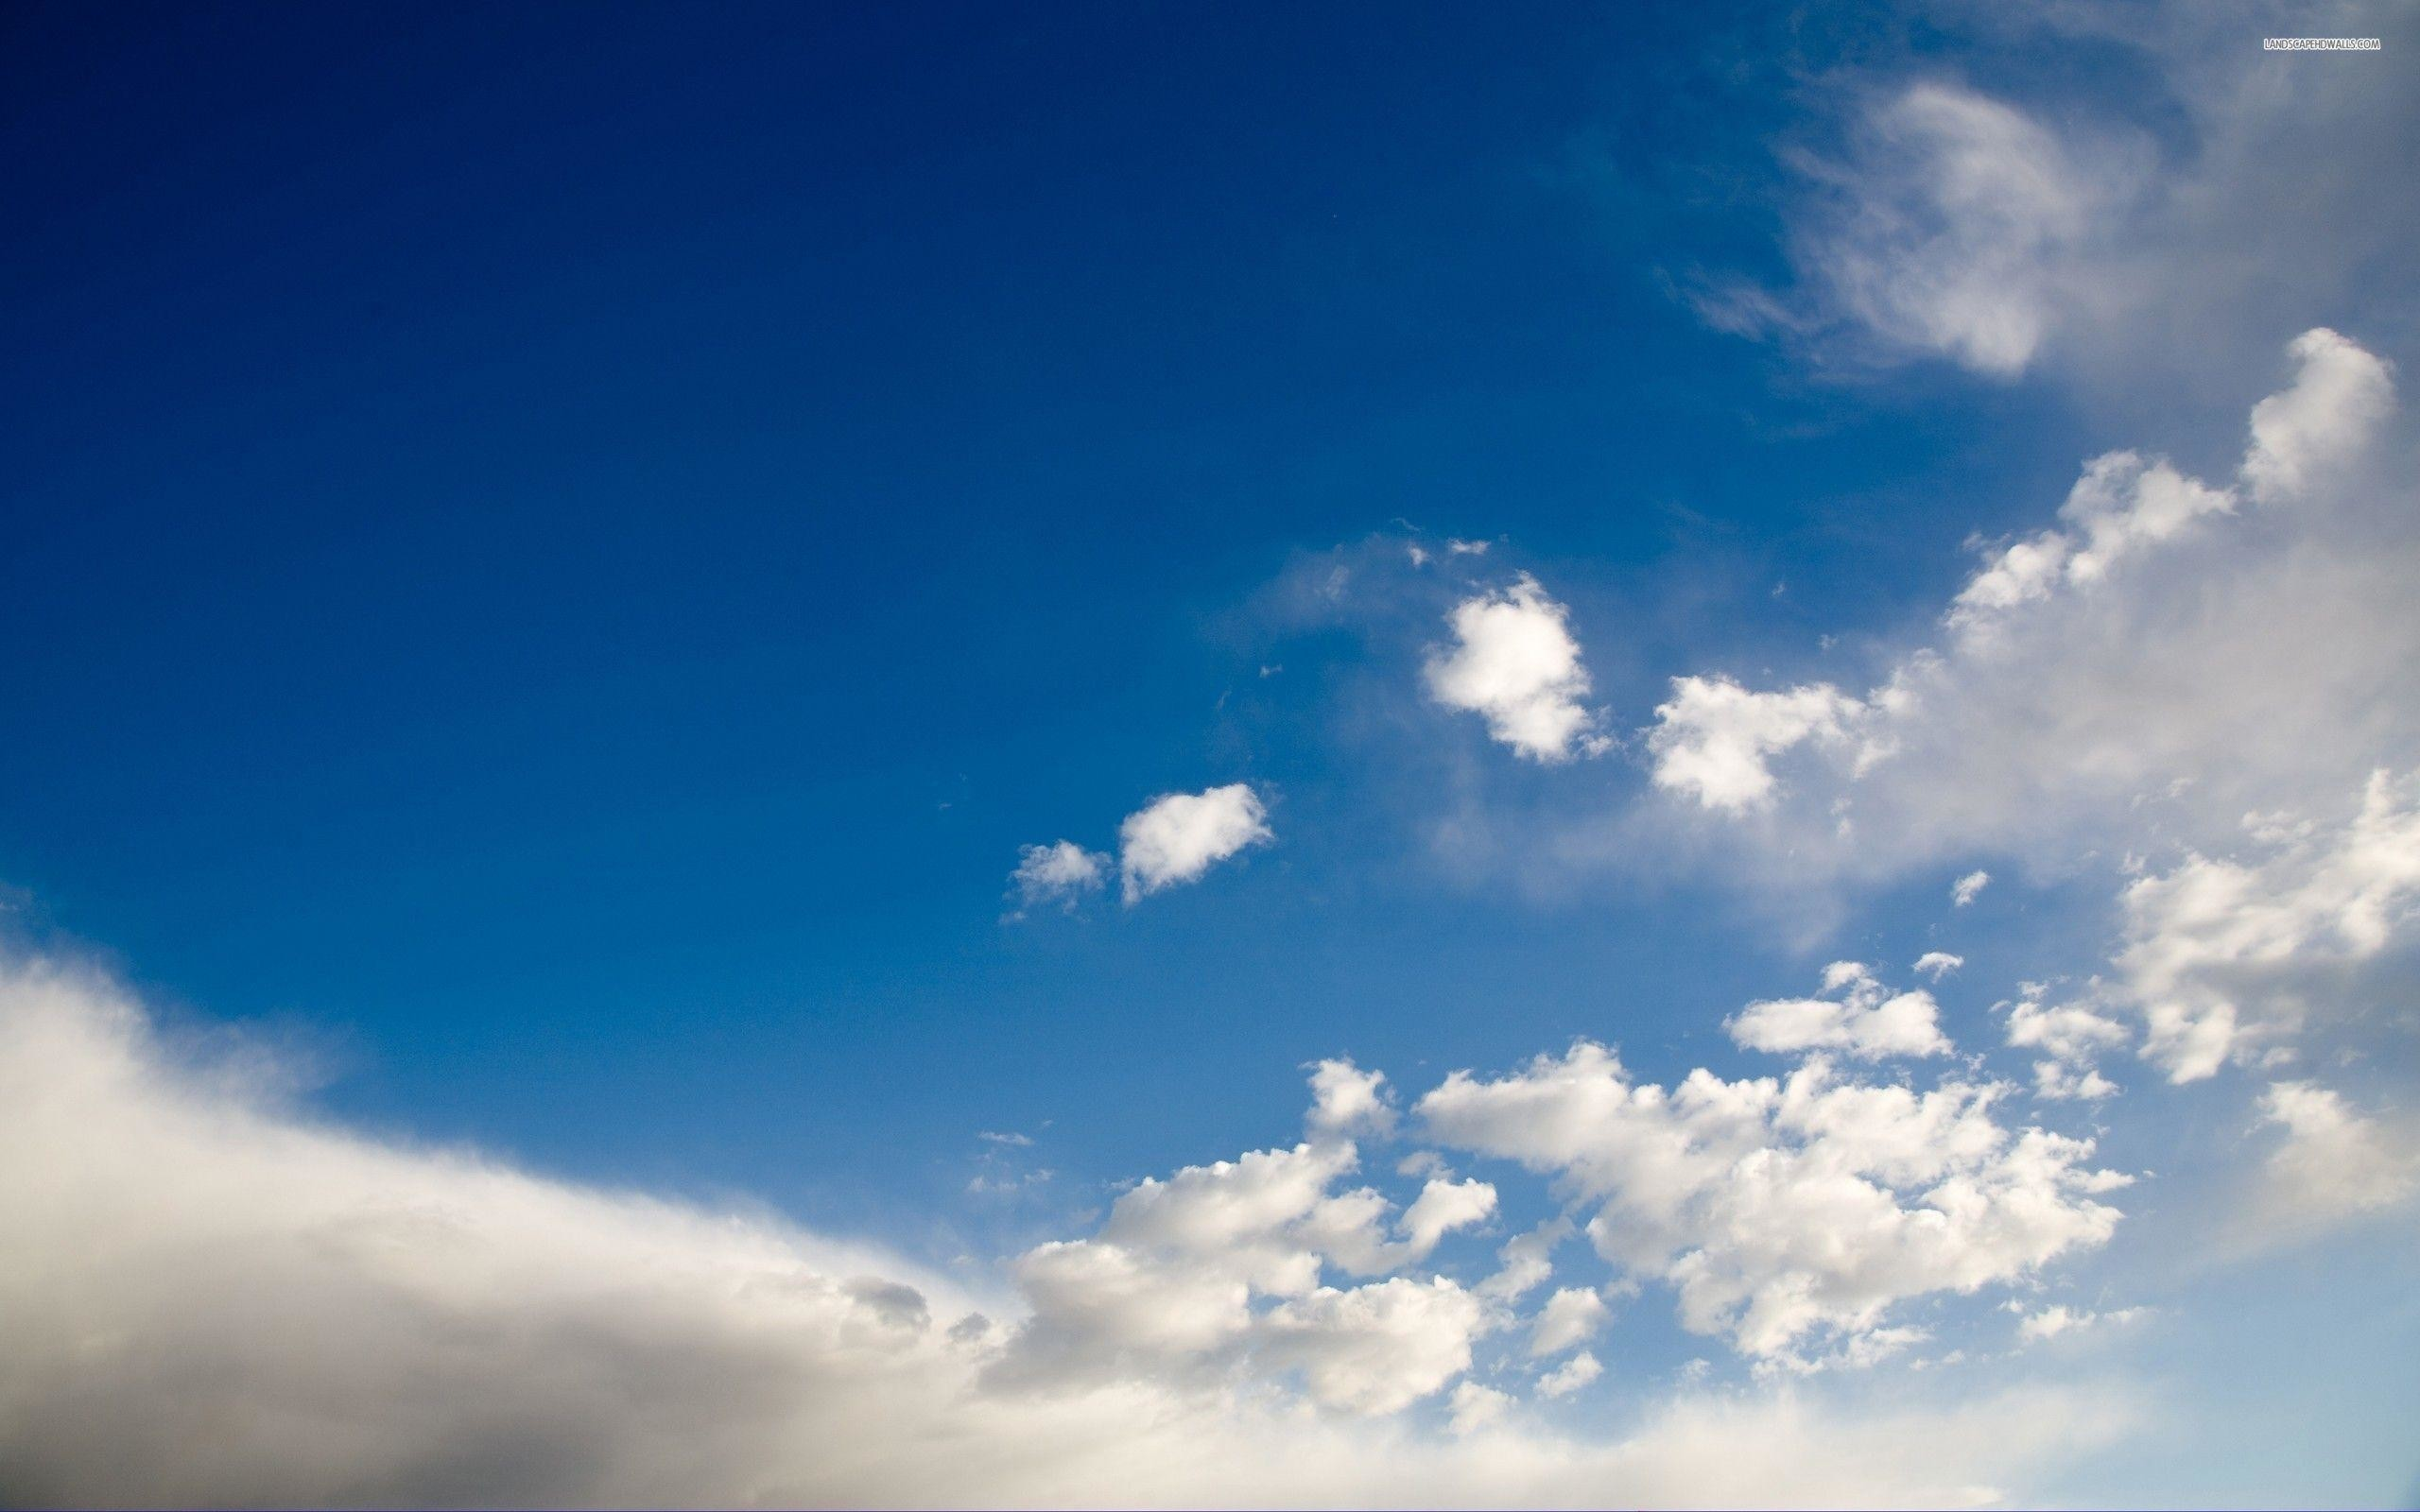 Cloudy Sky wallpaper #